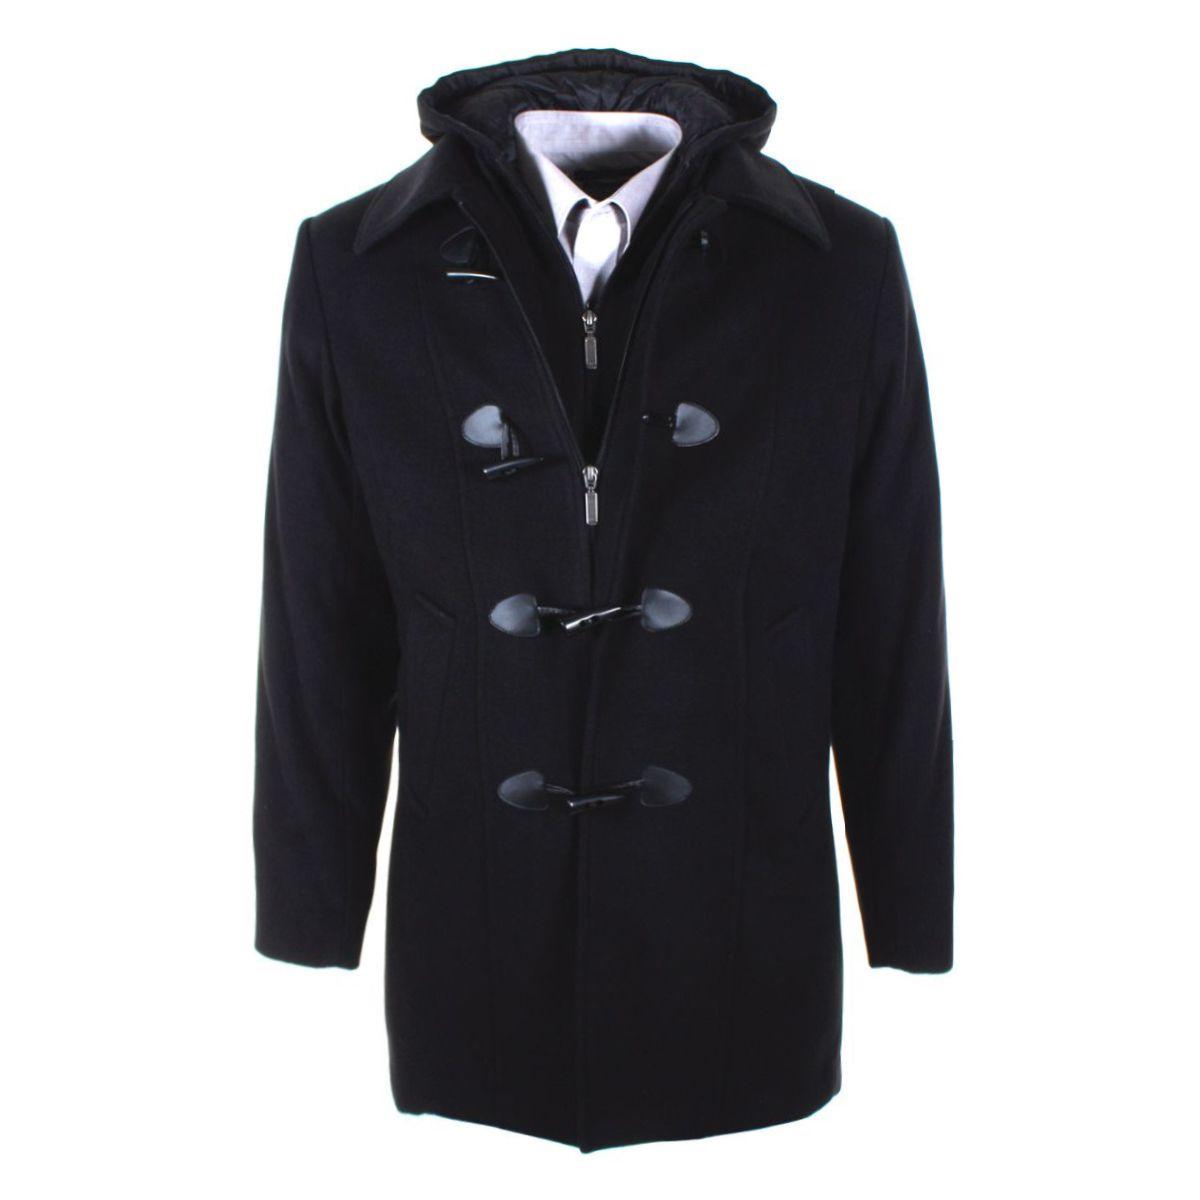 manteau femme grand col laine m03191 boutons dor s pictures to pin on pinterest. Black Bedroom Furniture Sets. Home Design Ideas